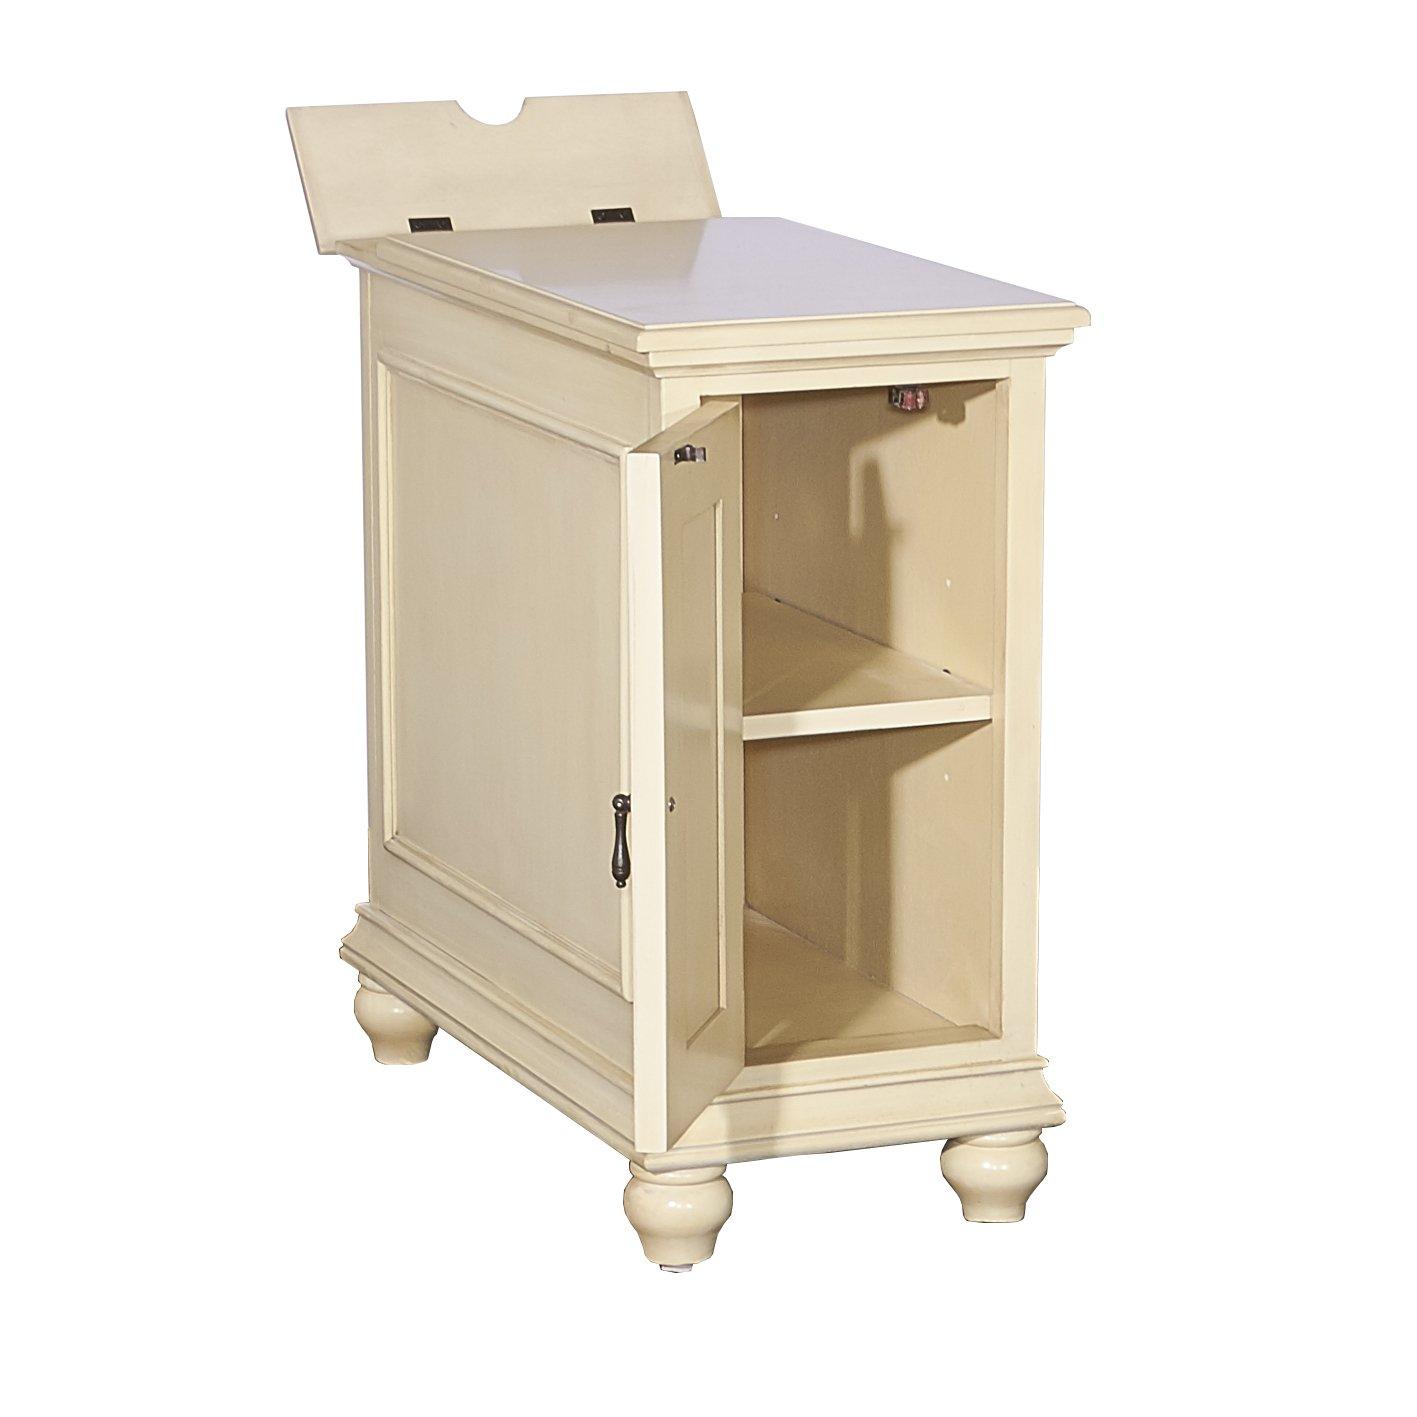 Cream Powell's Furniture 16A8257C Olsen Cream Shutter Cabinet,